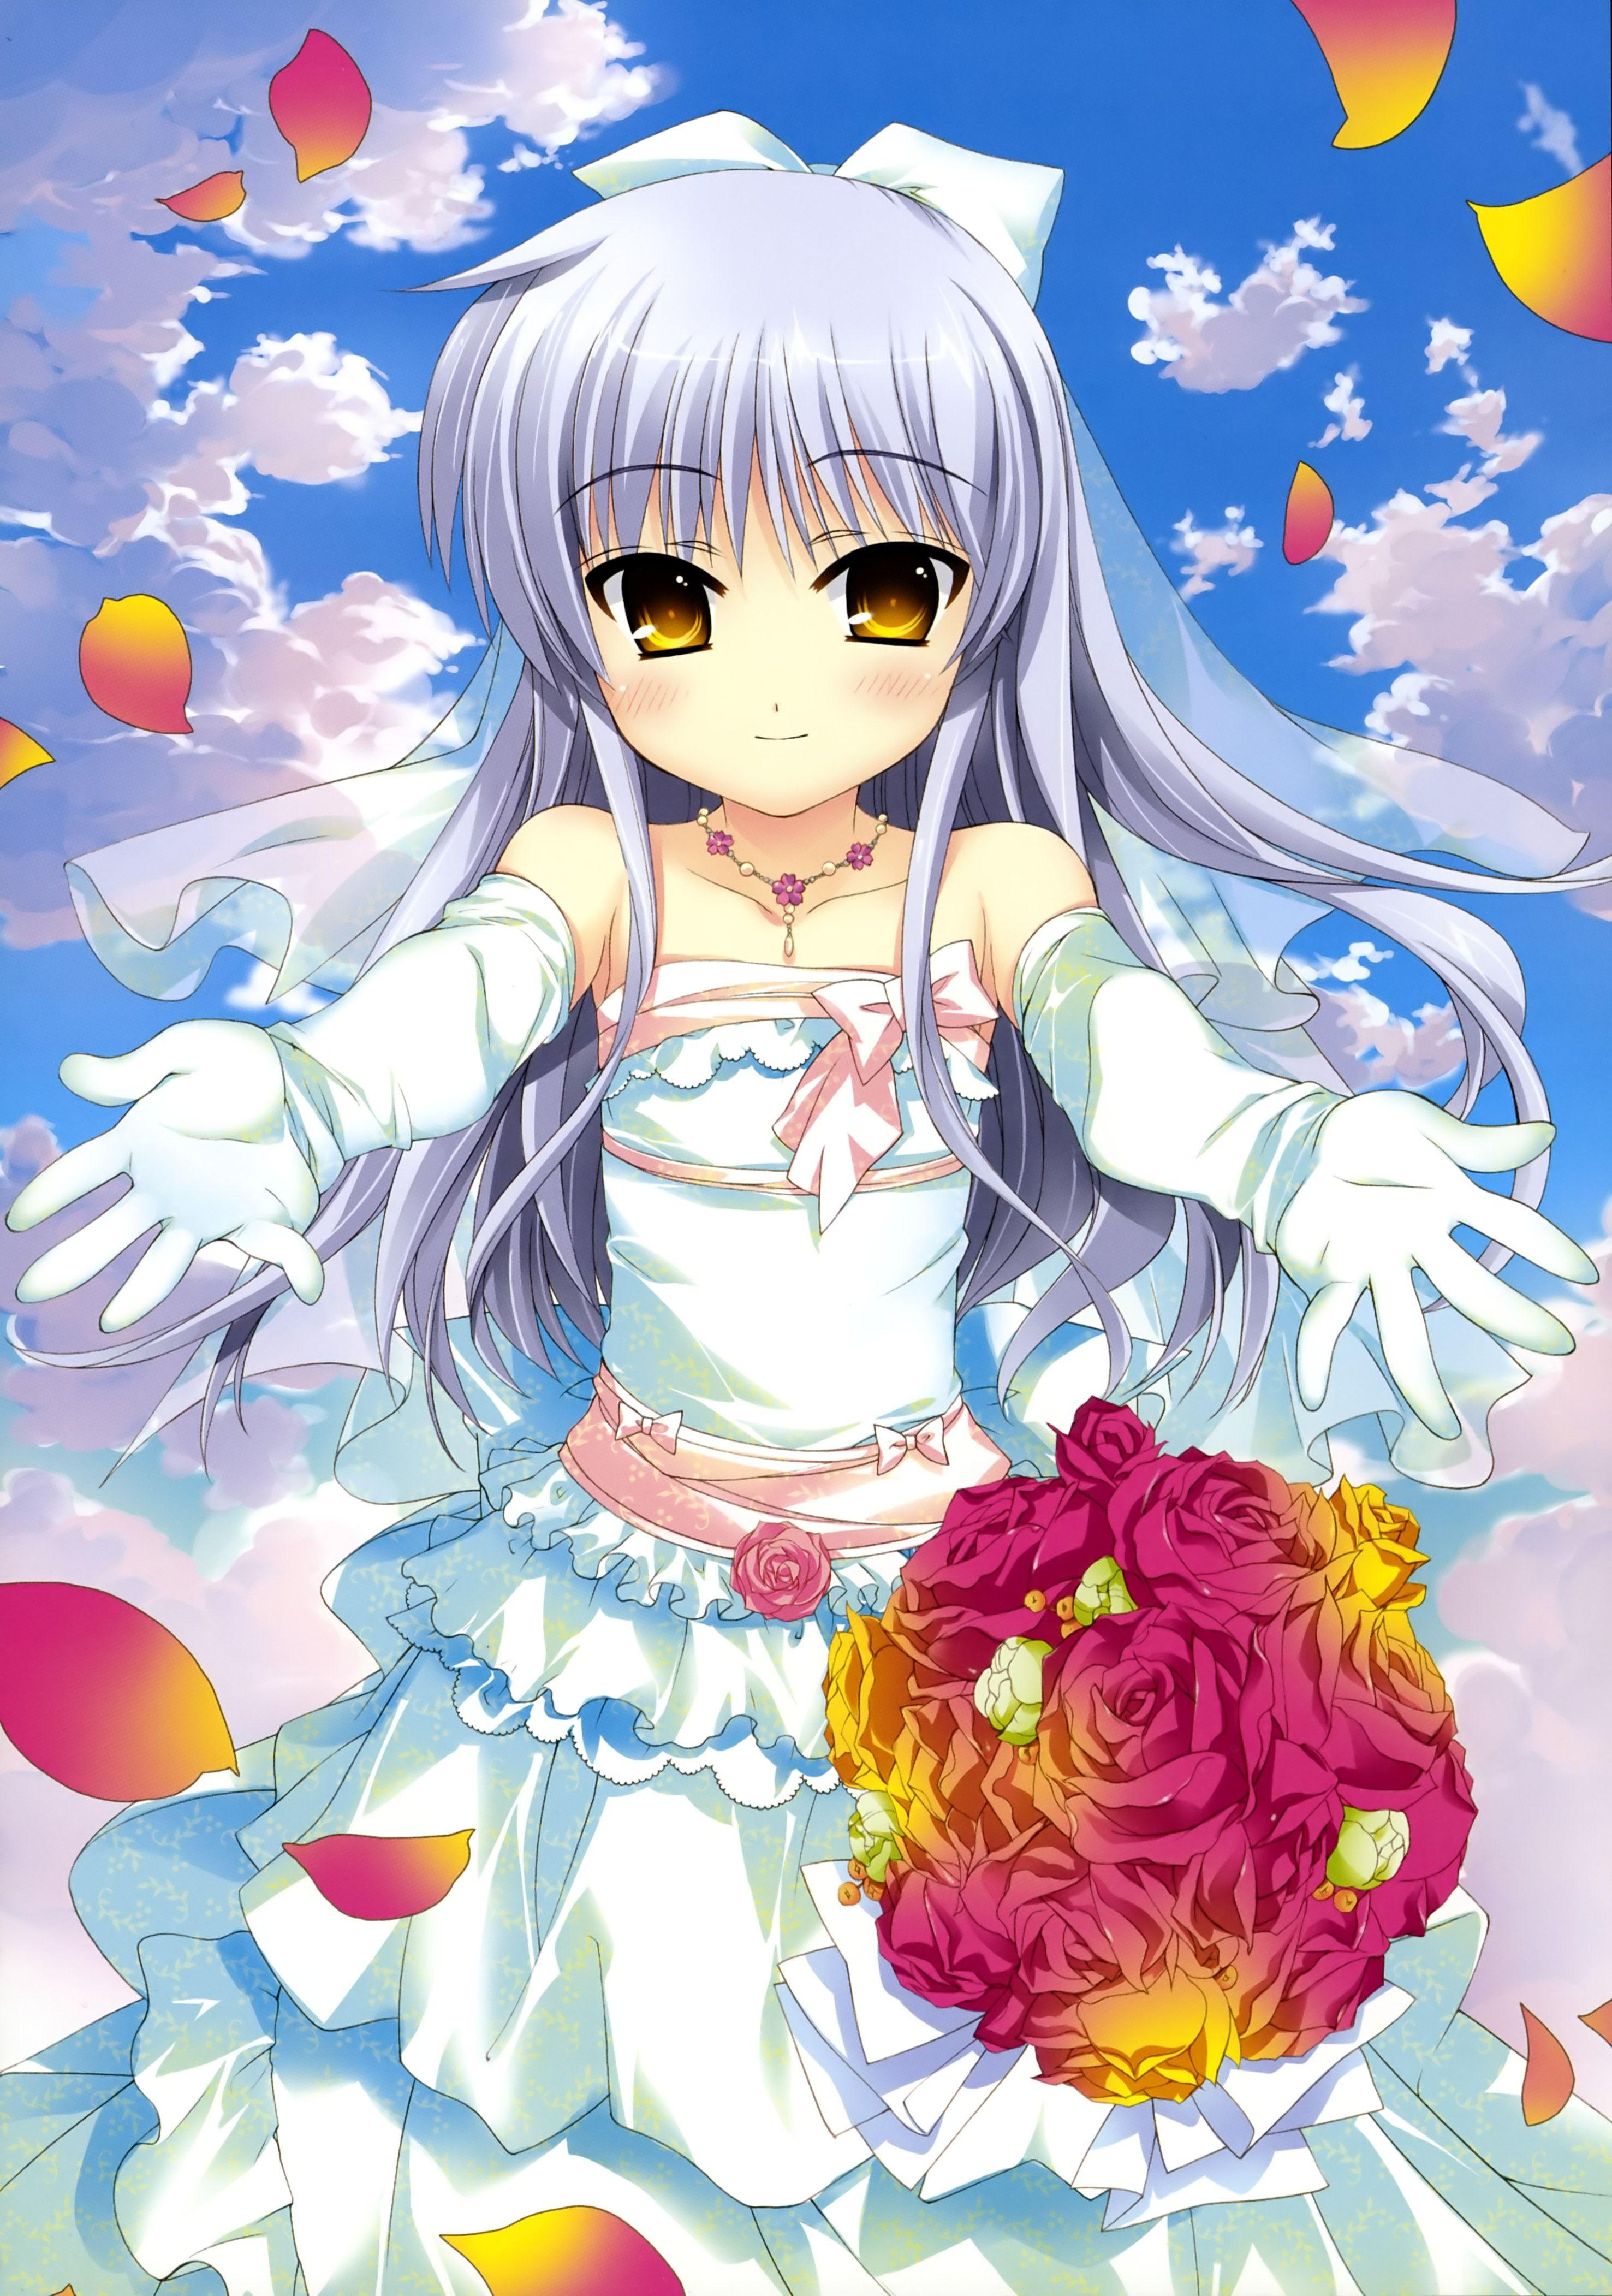 Tachibana Kanade 1085840 Angel Beats Angel Beats Anime Anime